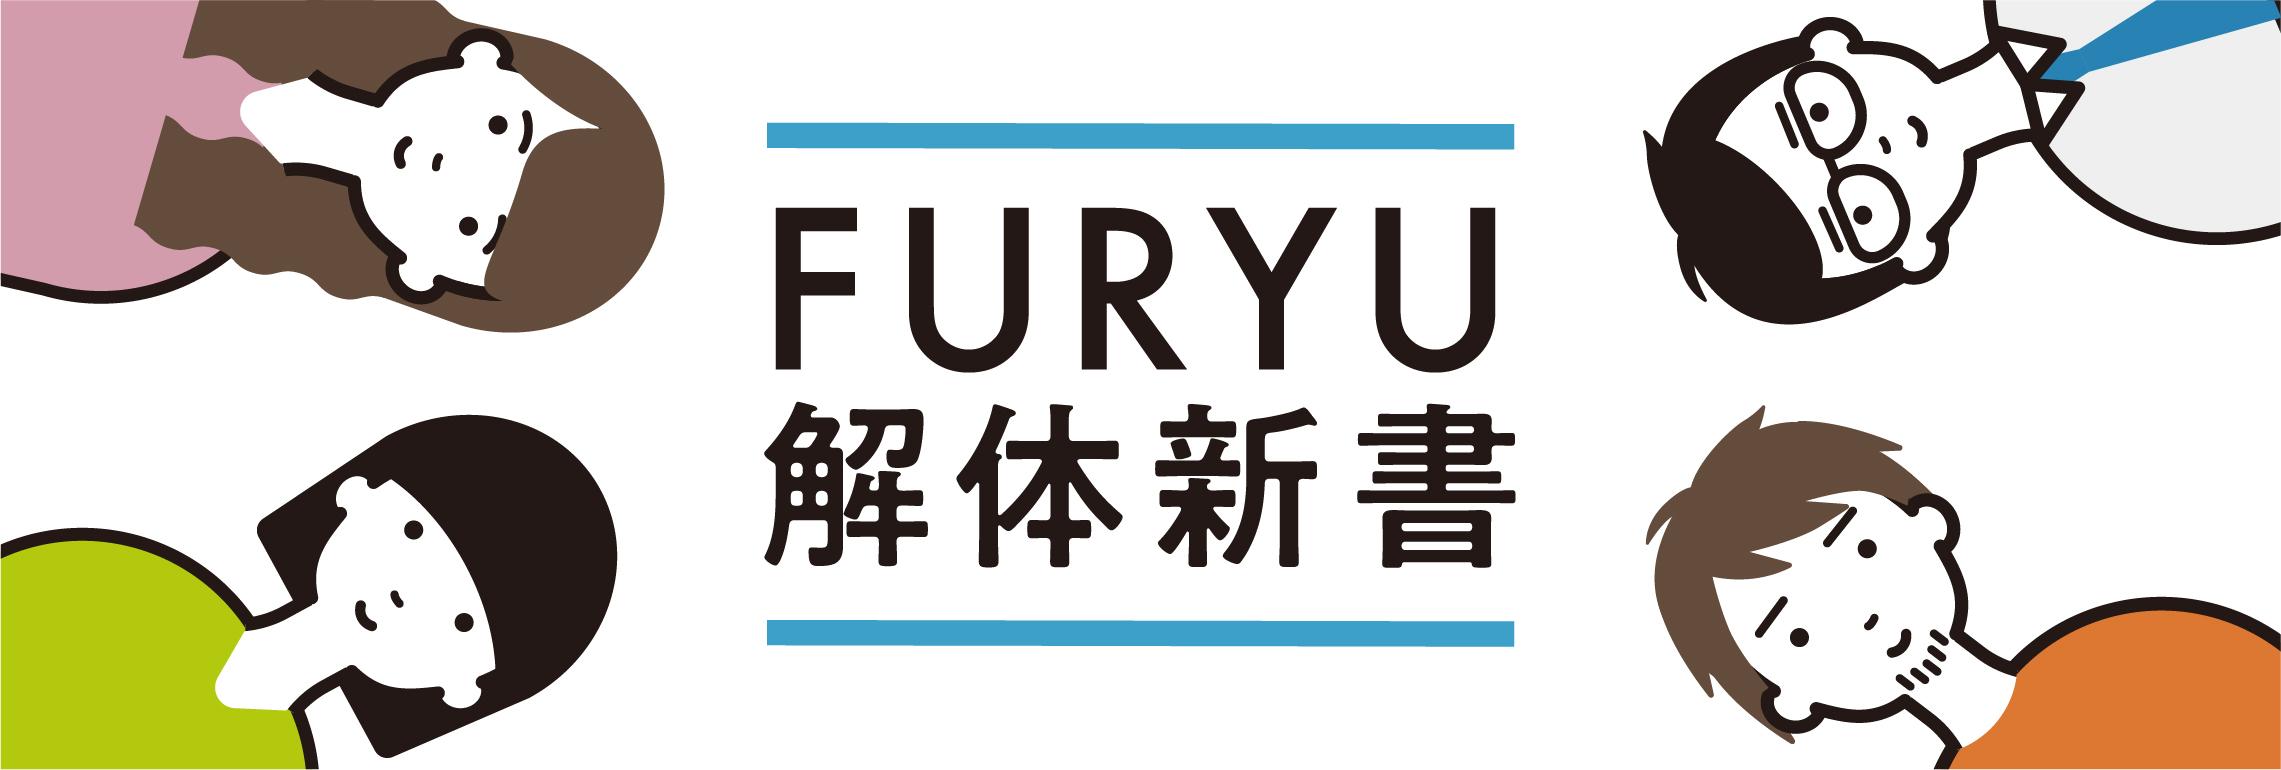 FURYU解体新書